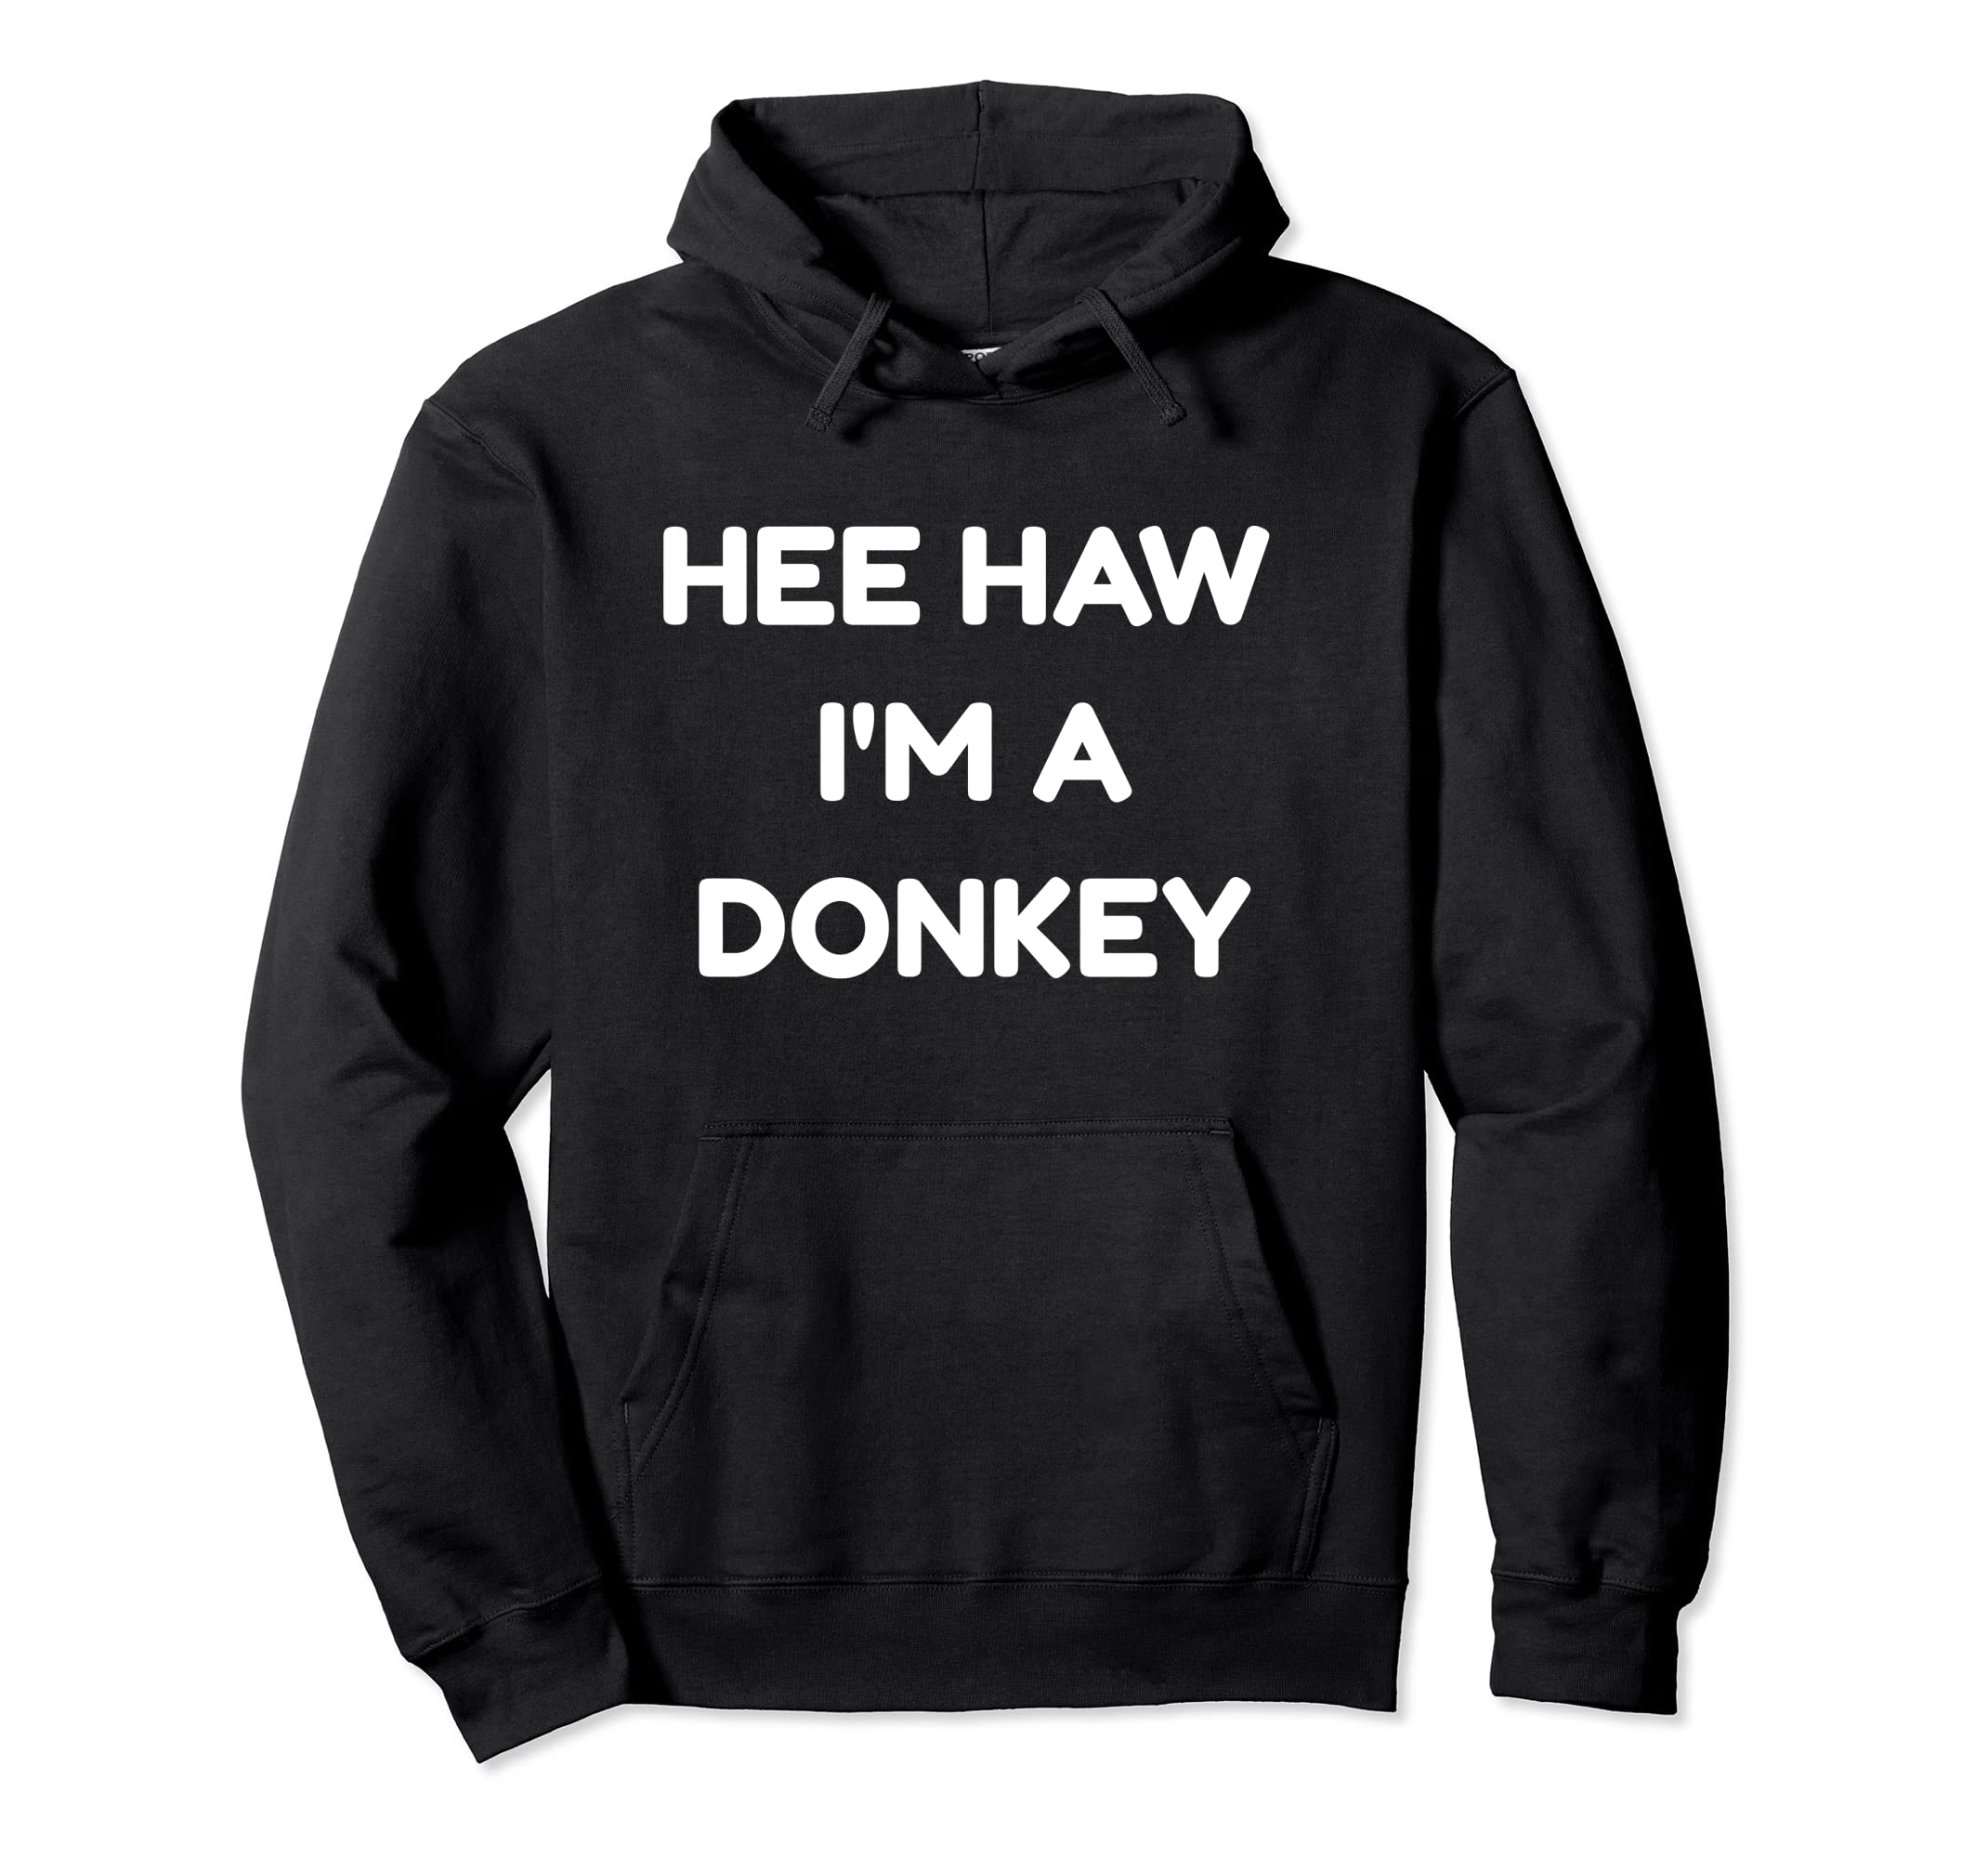 Donkey Funny Halloween Costume Hoodie Hee Haw-ANZ